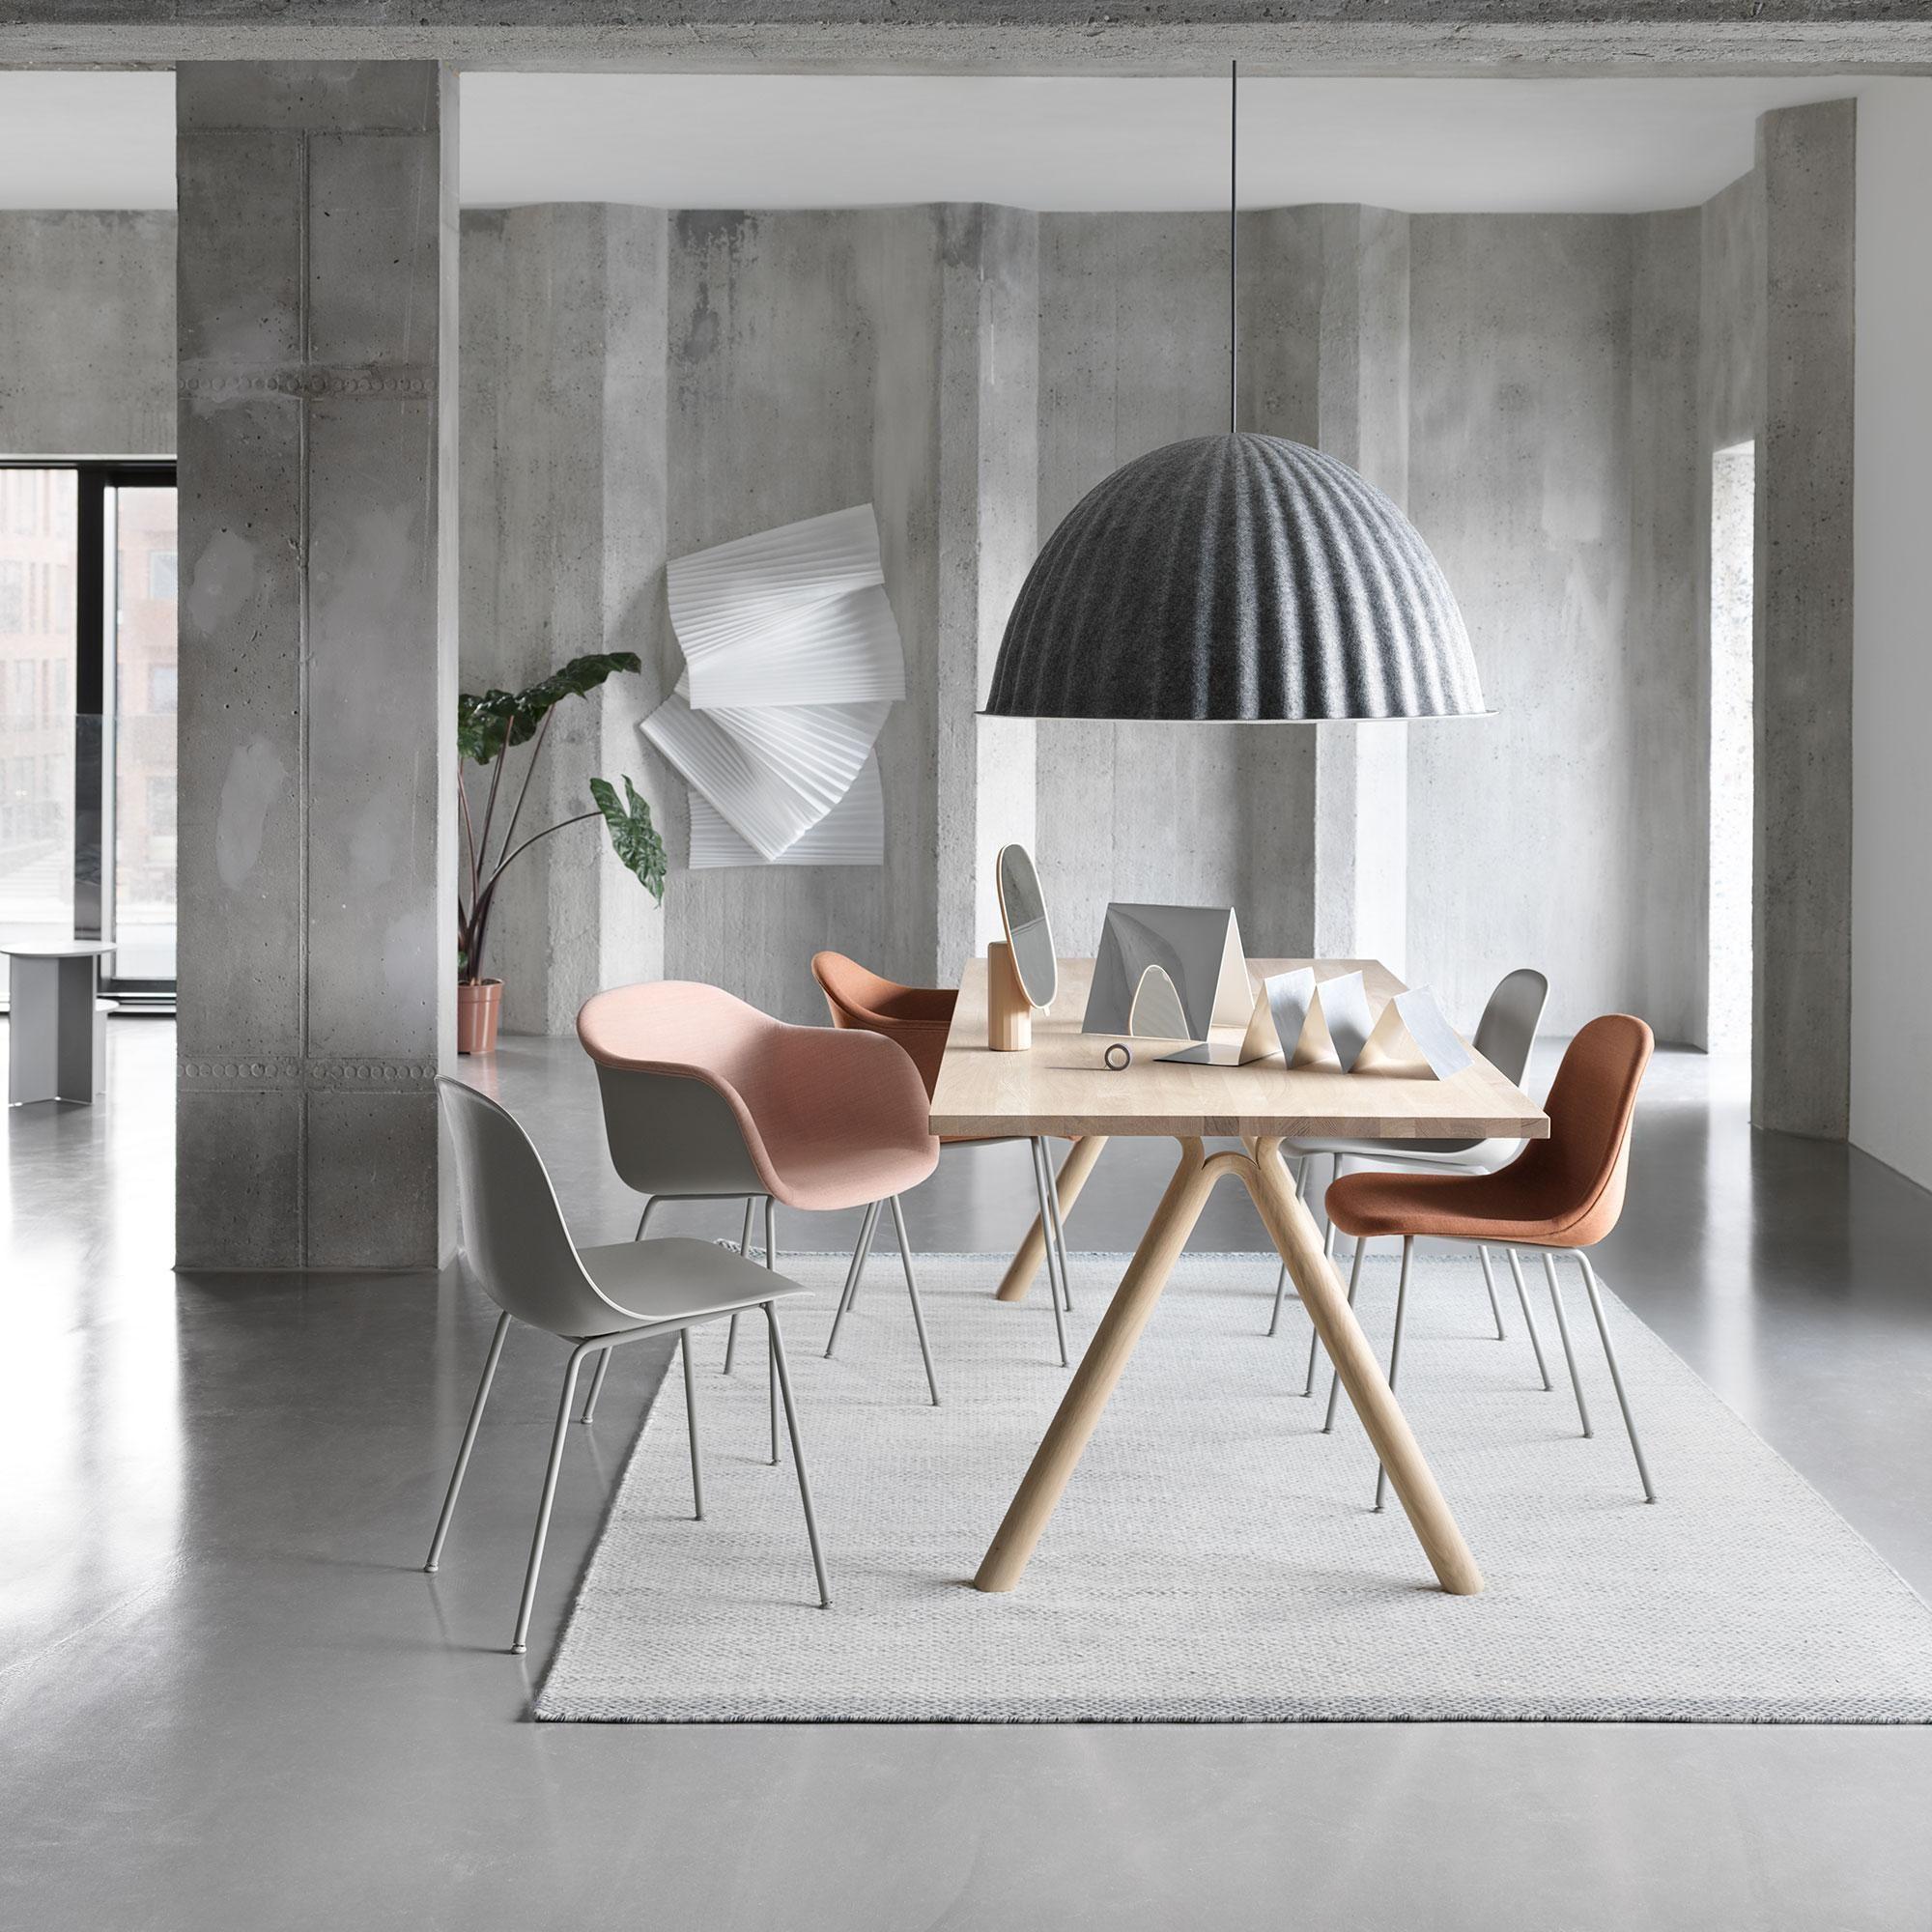 Muuto fiber chair stuhl gepolstert mit rohrgestell for Stuhl gepolstert